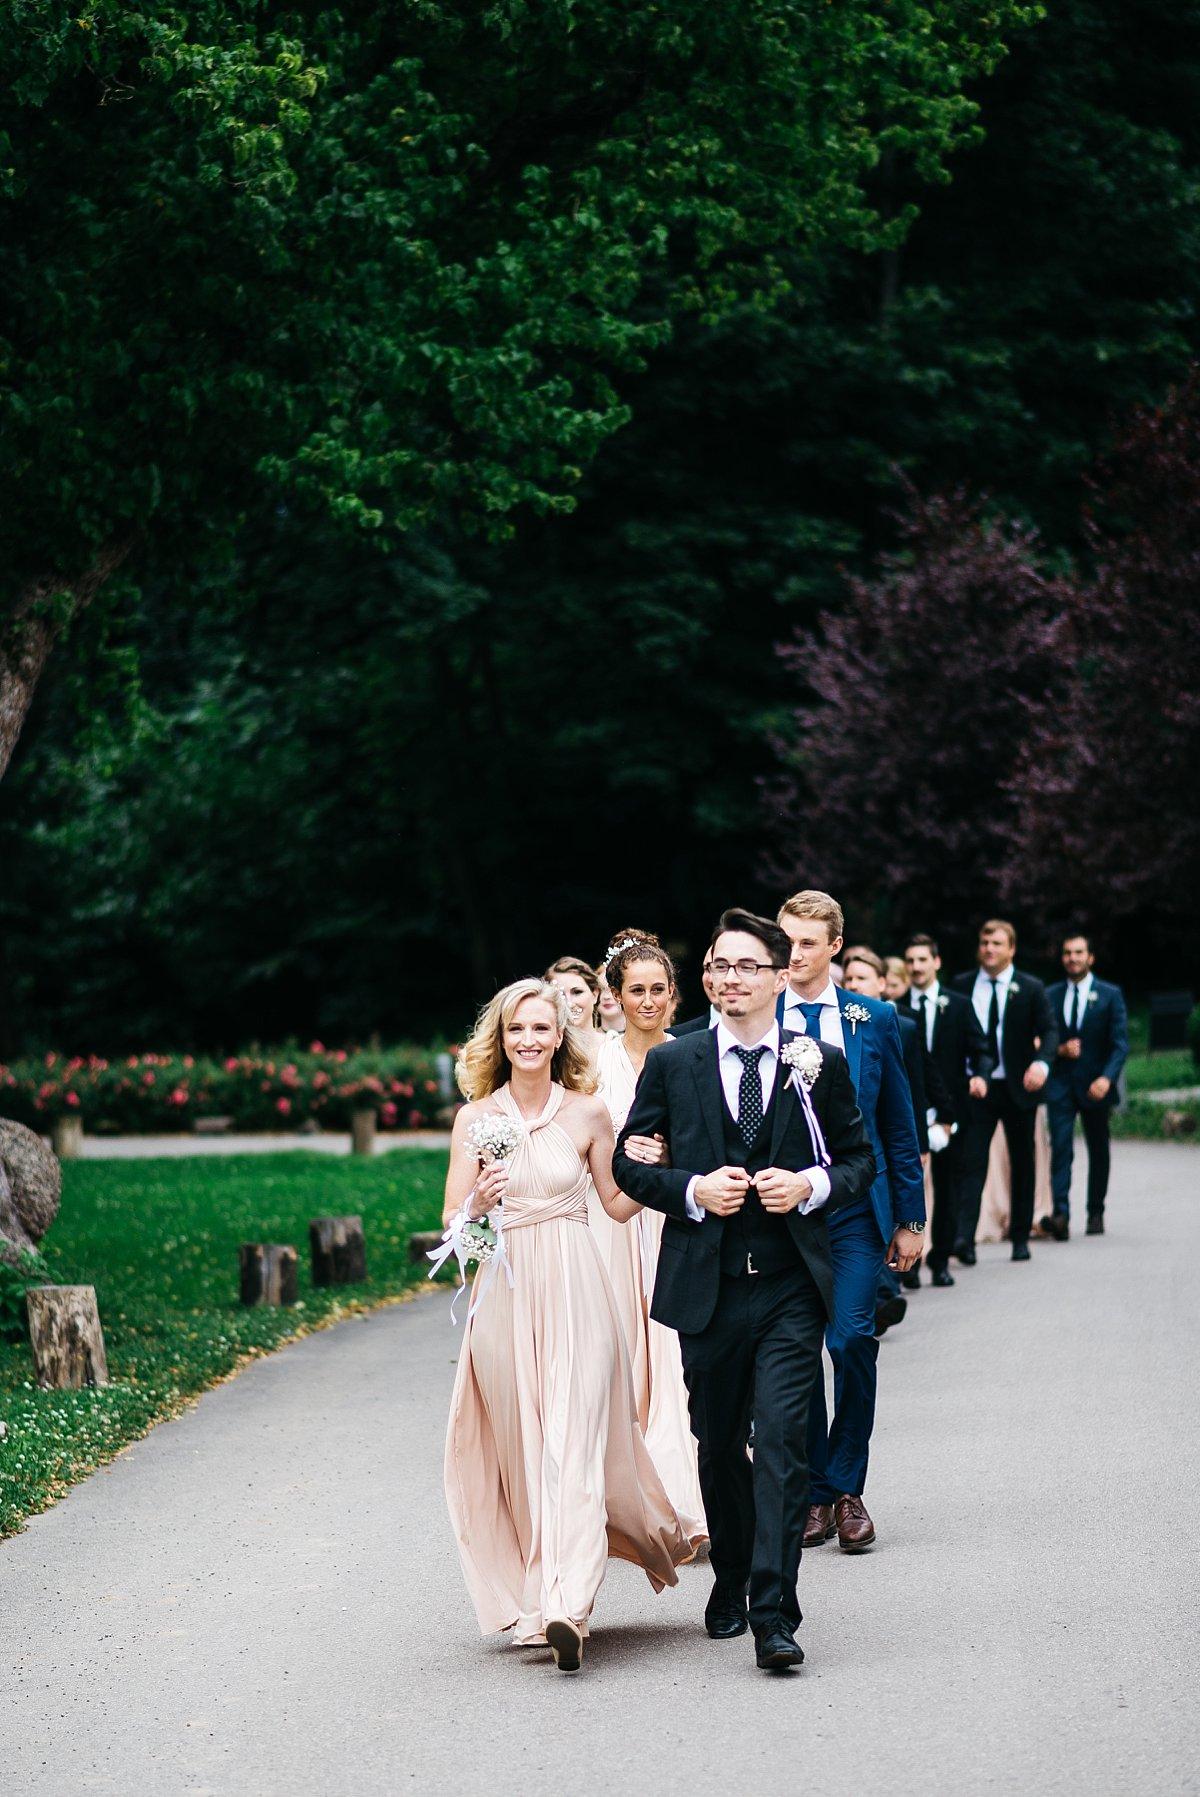 daniel-lopez-perez-wedding-photographer-austria-041